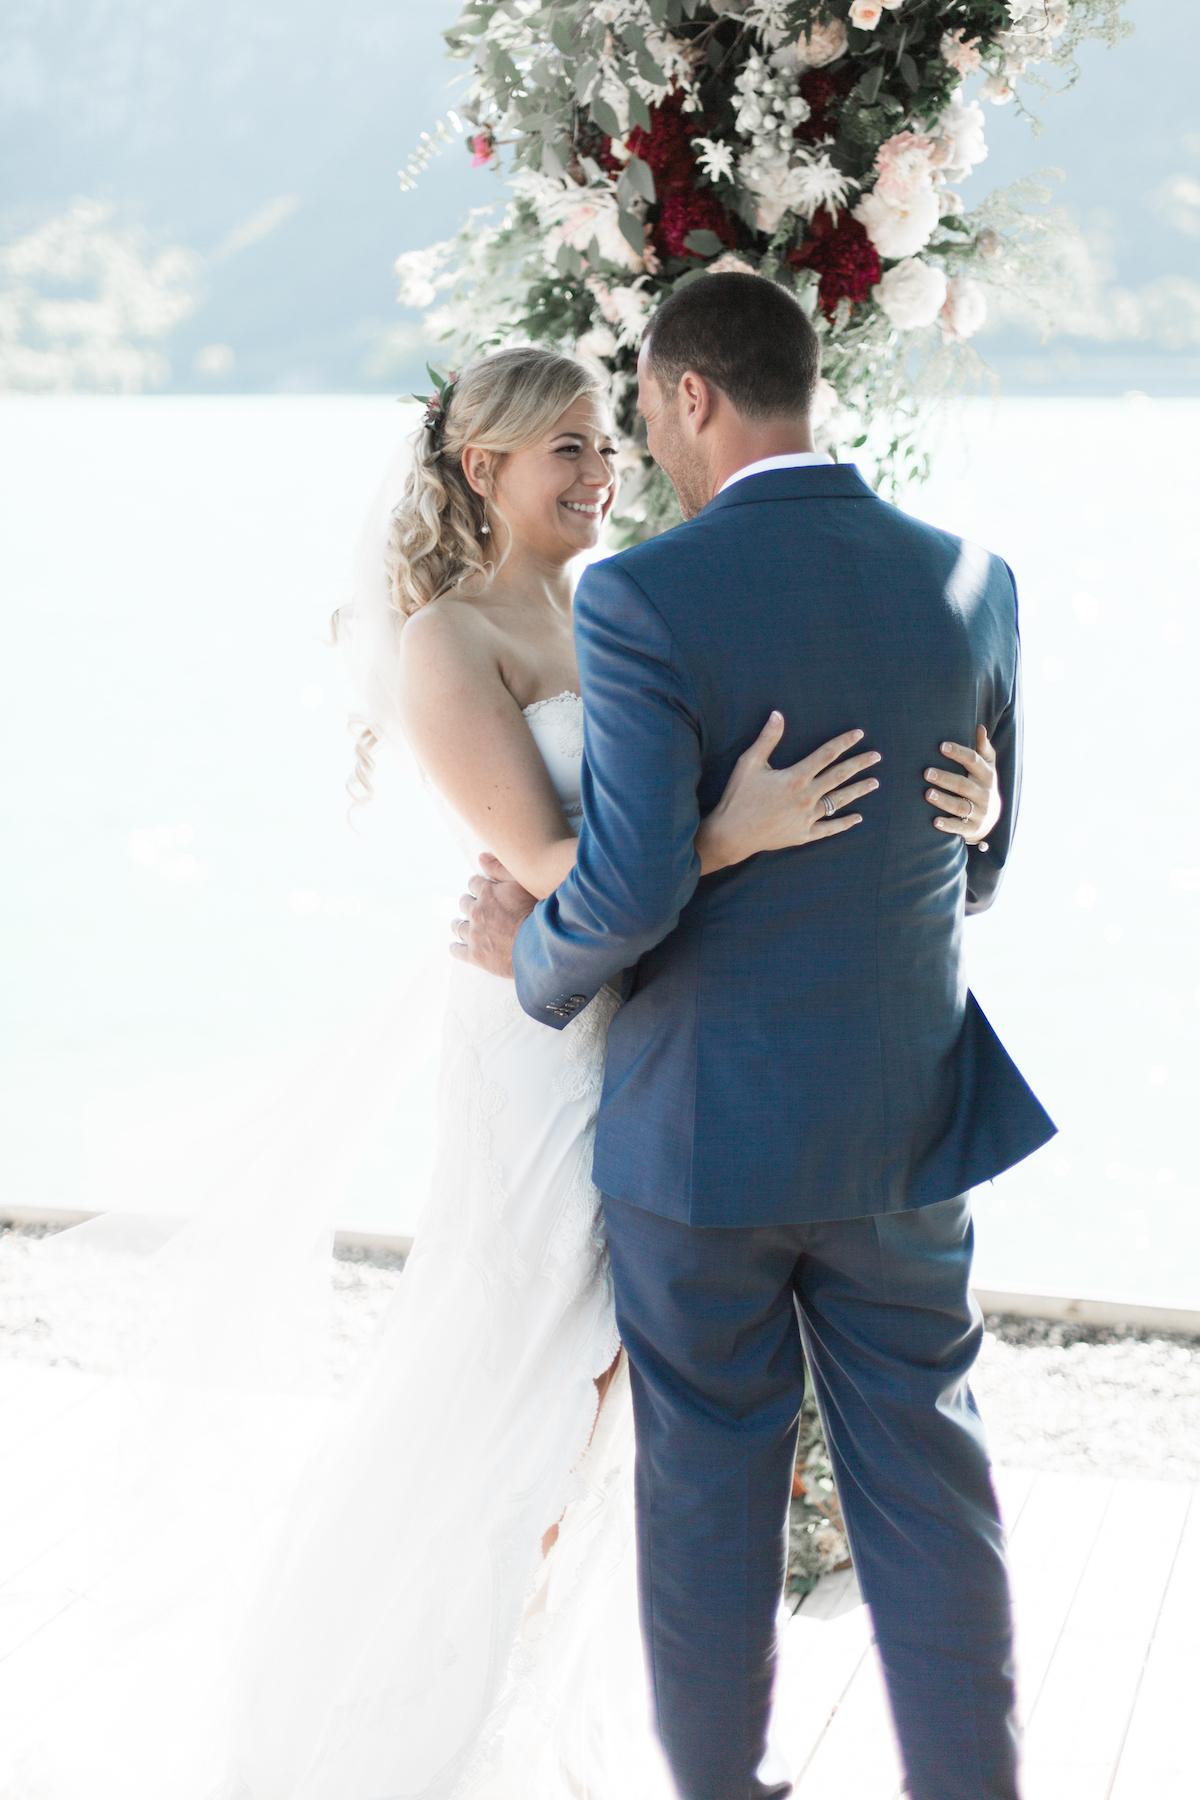 annecy-wedding-photos-139.jpg